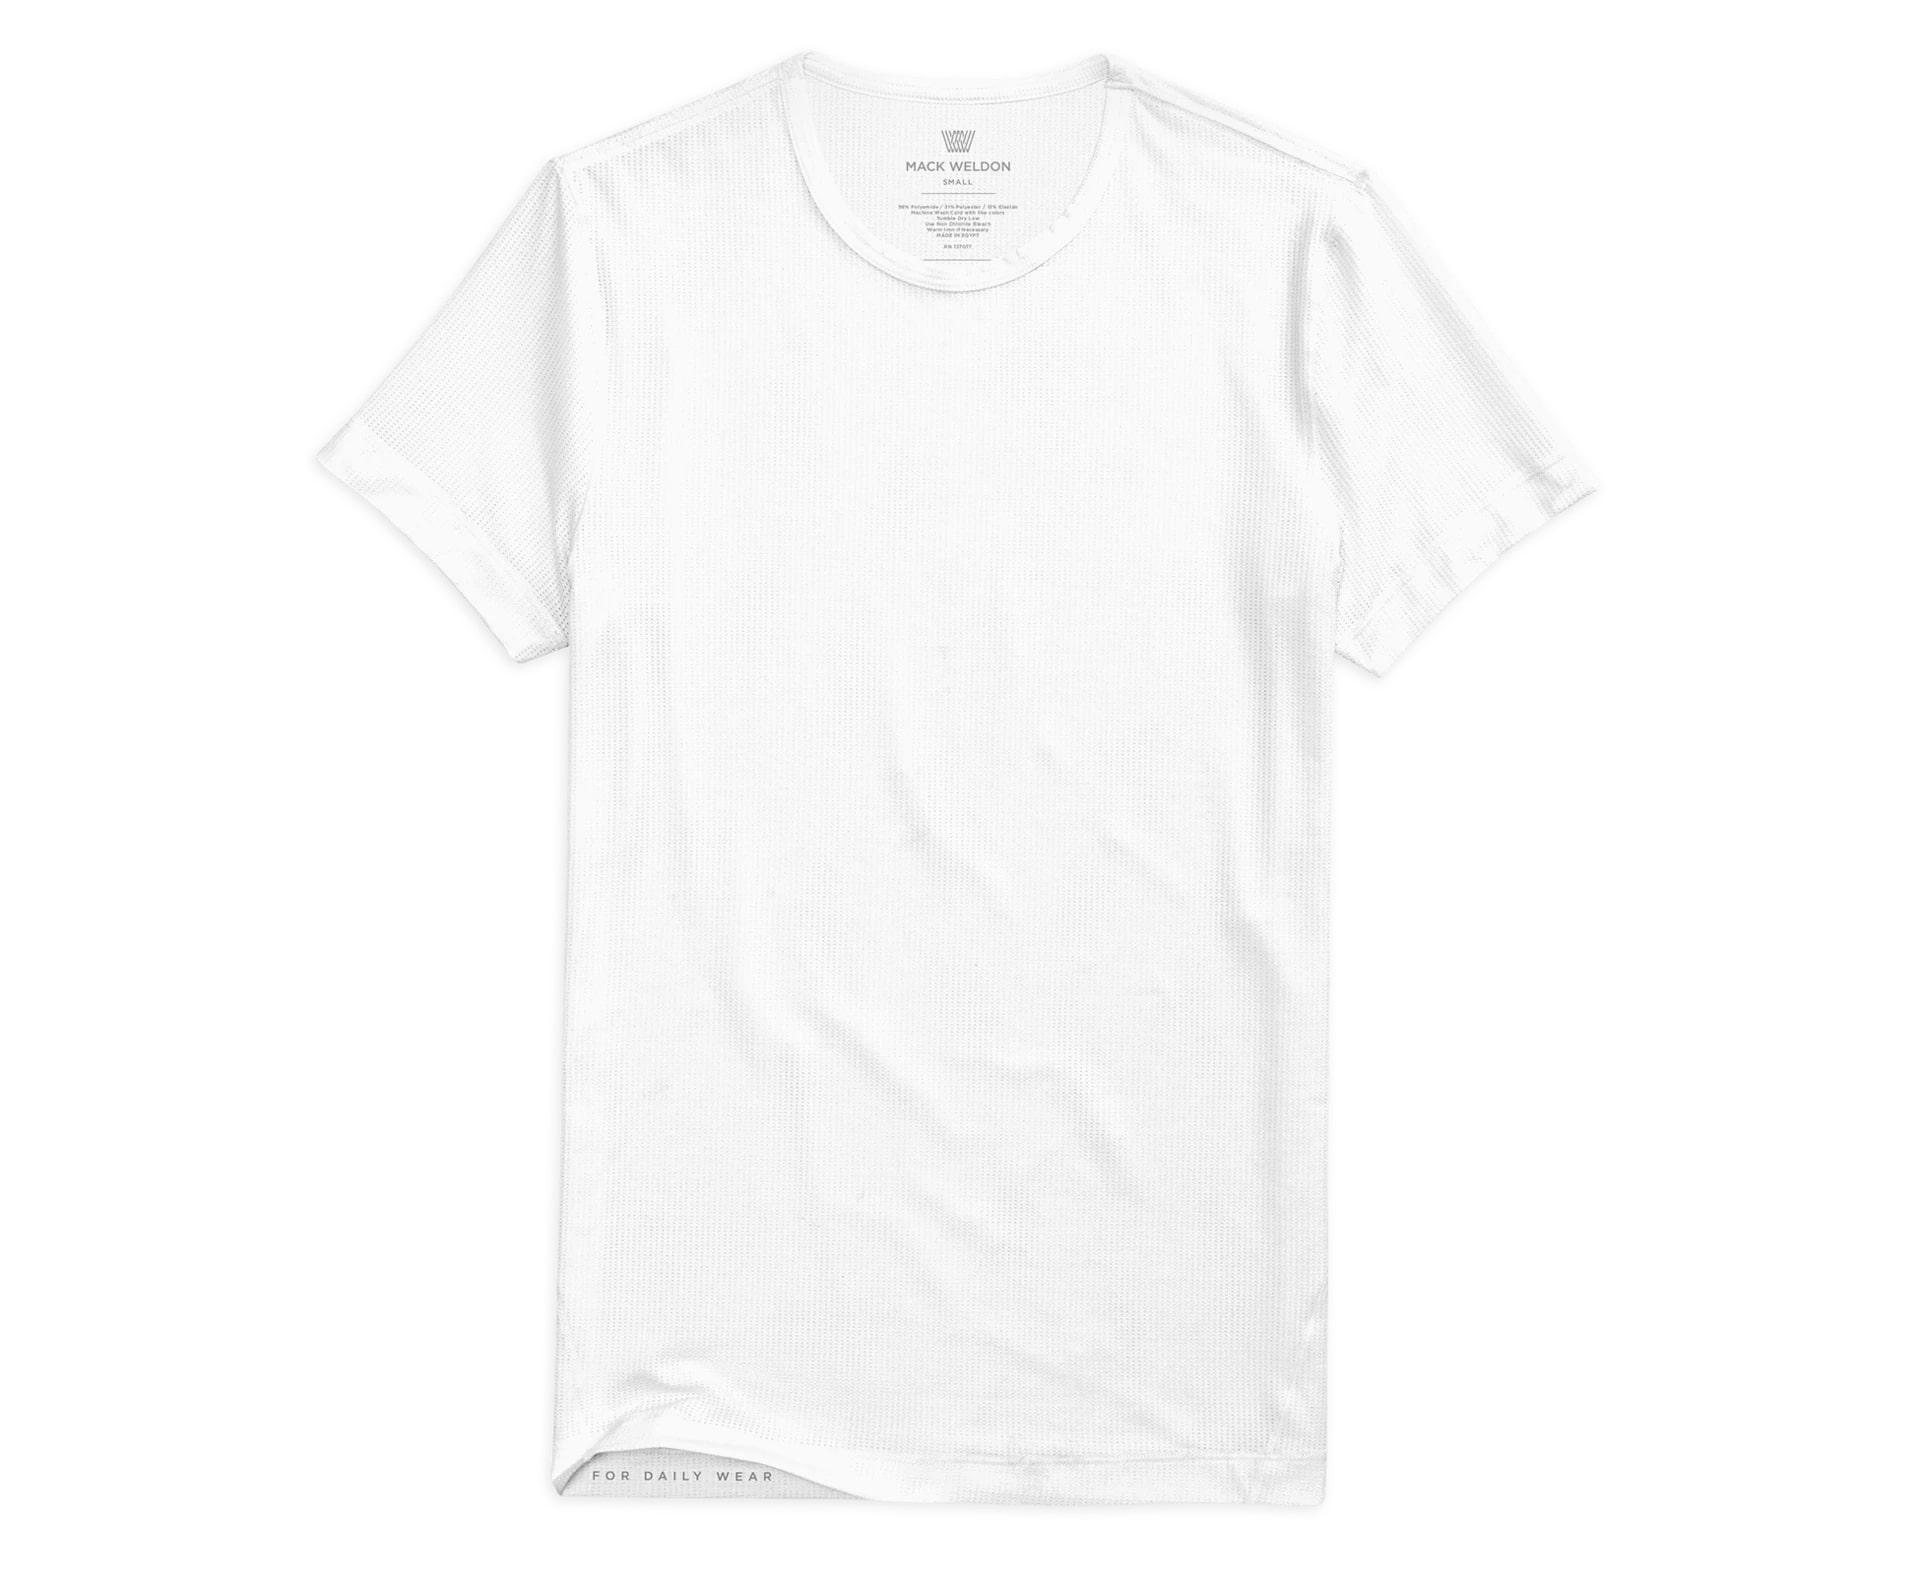 Mack Weldon Airknitx Crew Neck Undershirt in white; best undershirts for men